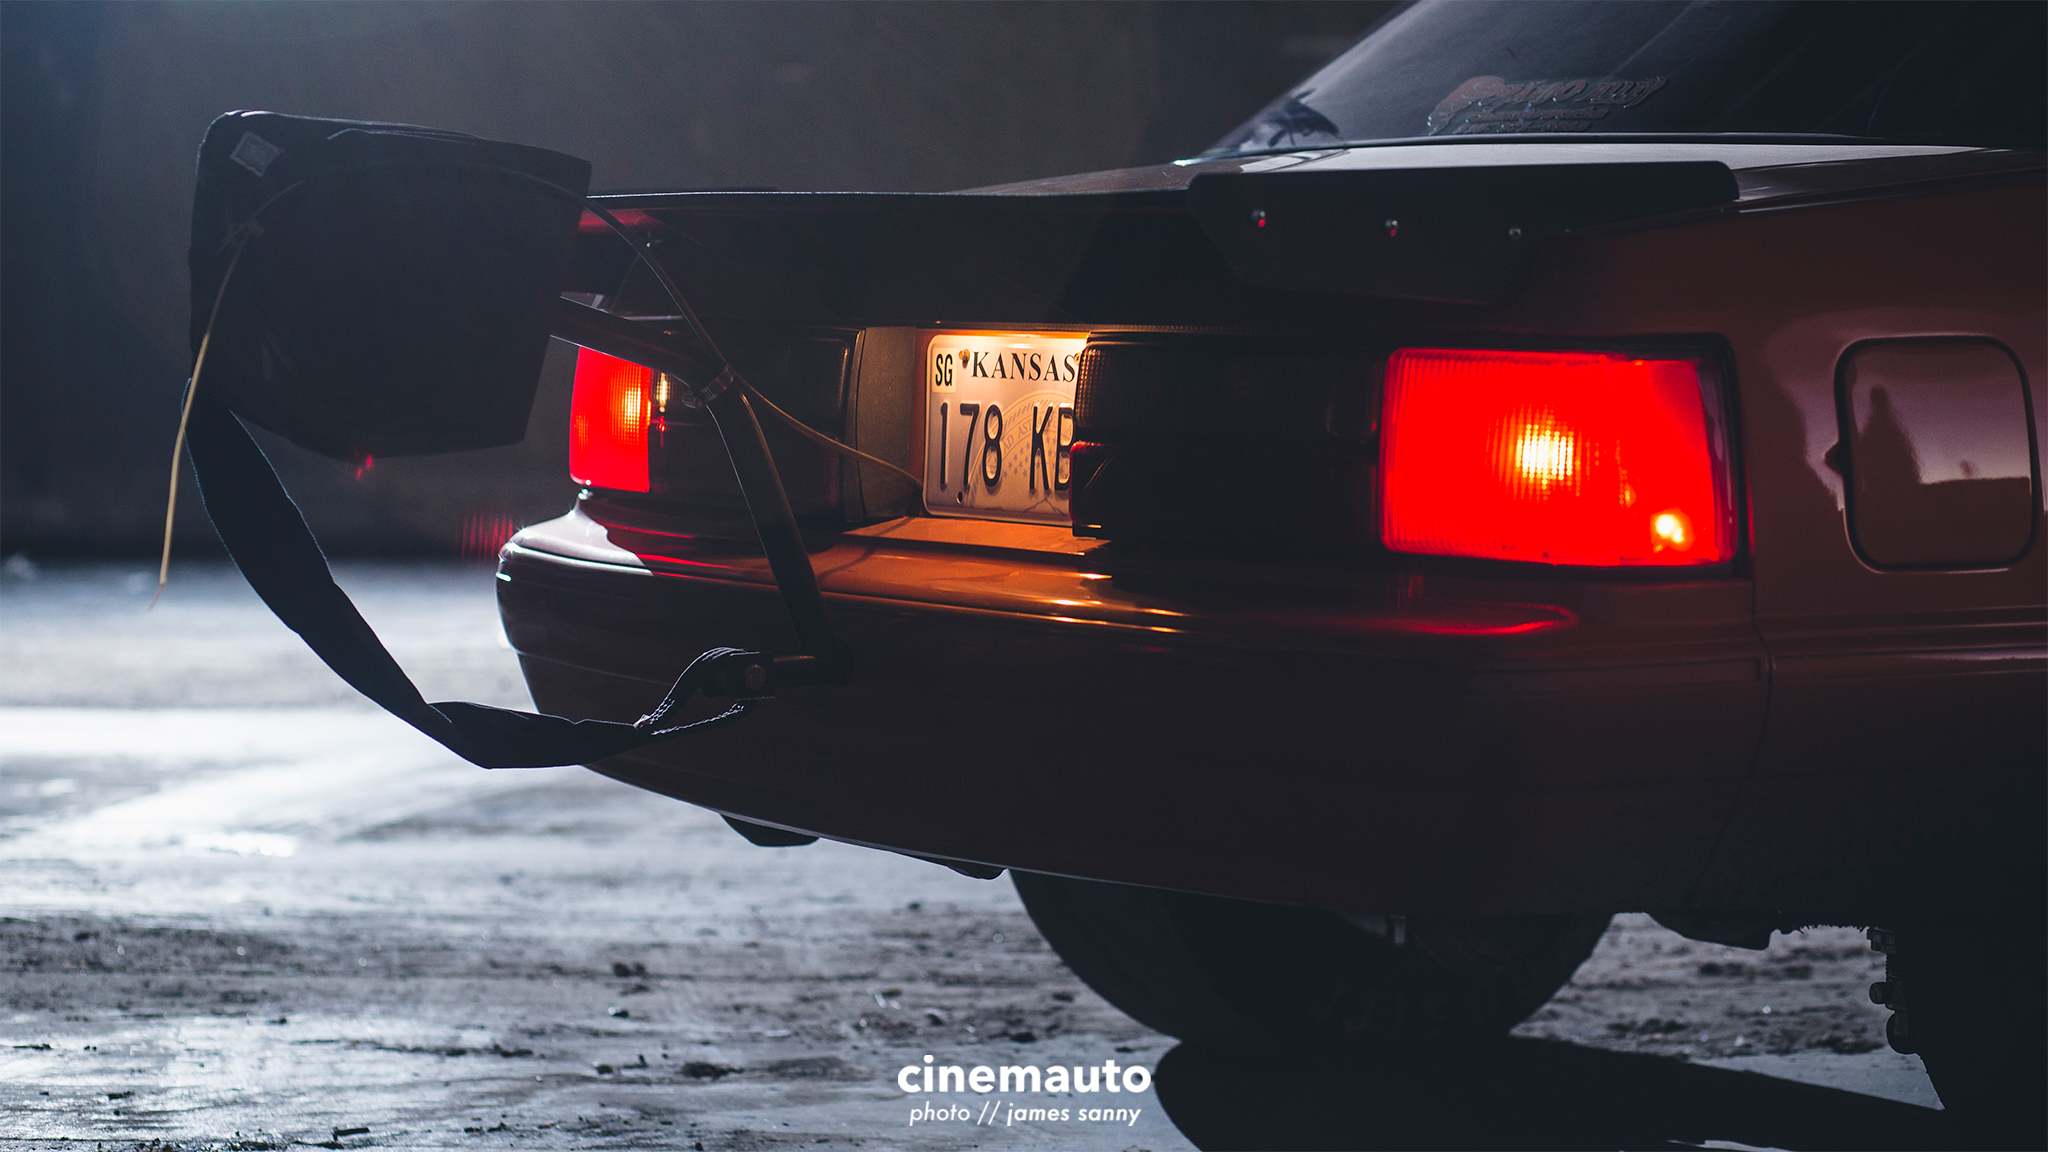 wichita-automotive-photography-kansas-racecar-4.jpg